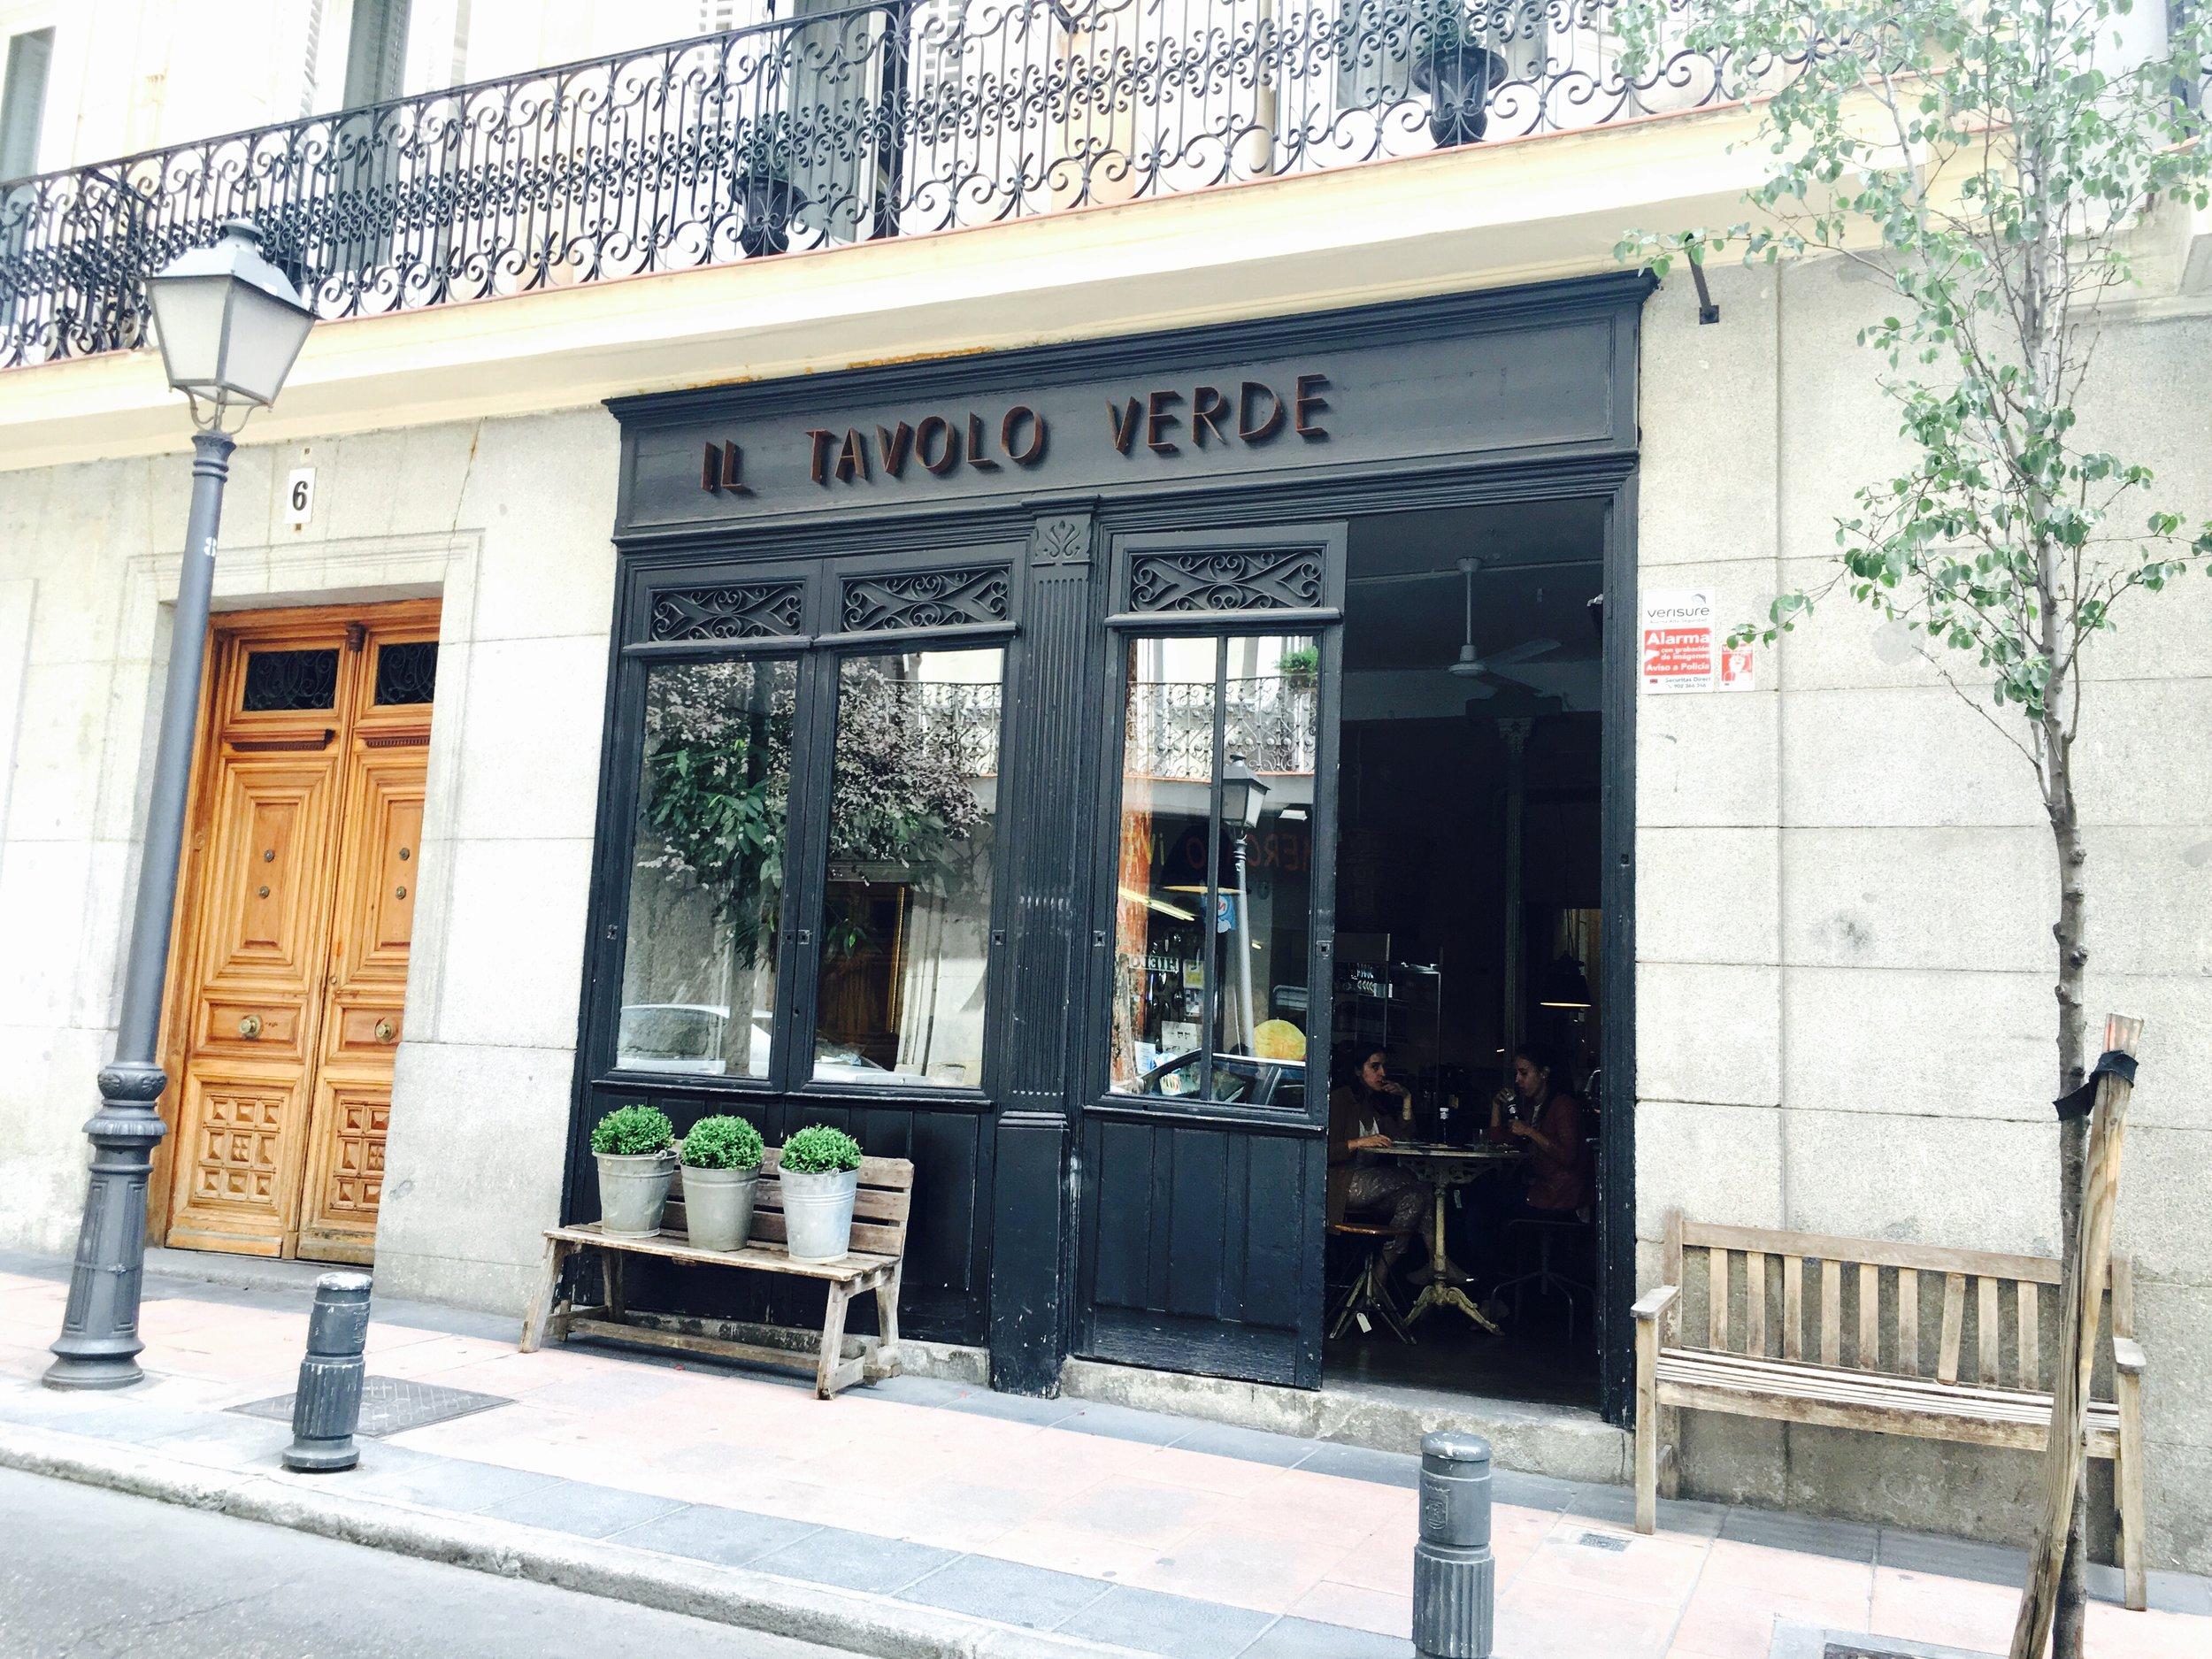 Entrada de madera pintada muy bonitaCalle Villalar, 6, 28001 Madrid  Teléfono:  +34 918 05 15 12   Email:  info@iltavoloverde.com   Web:  http://www.iltavoloverde.com